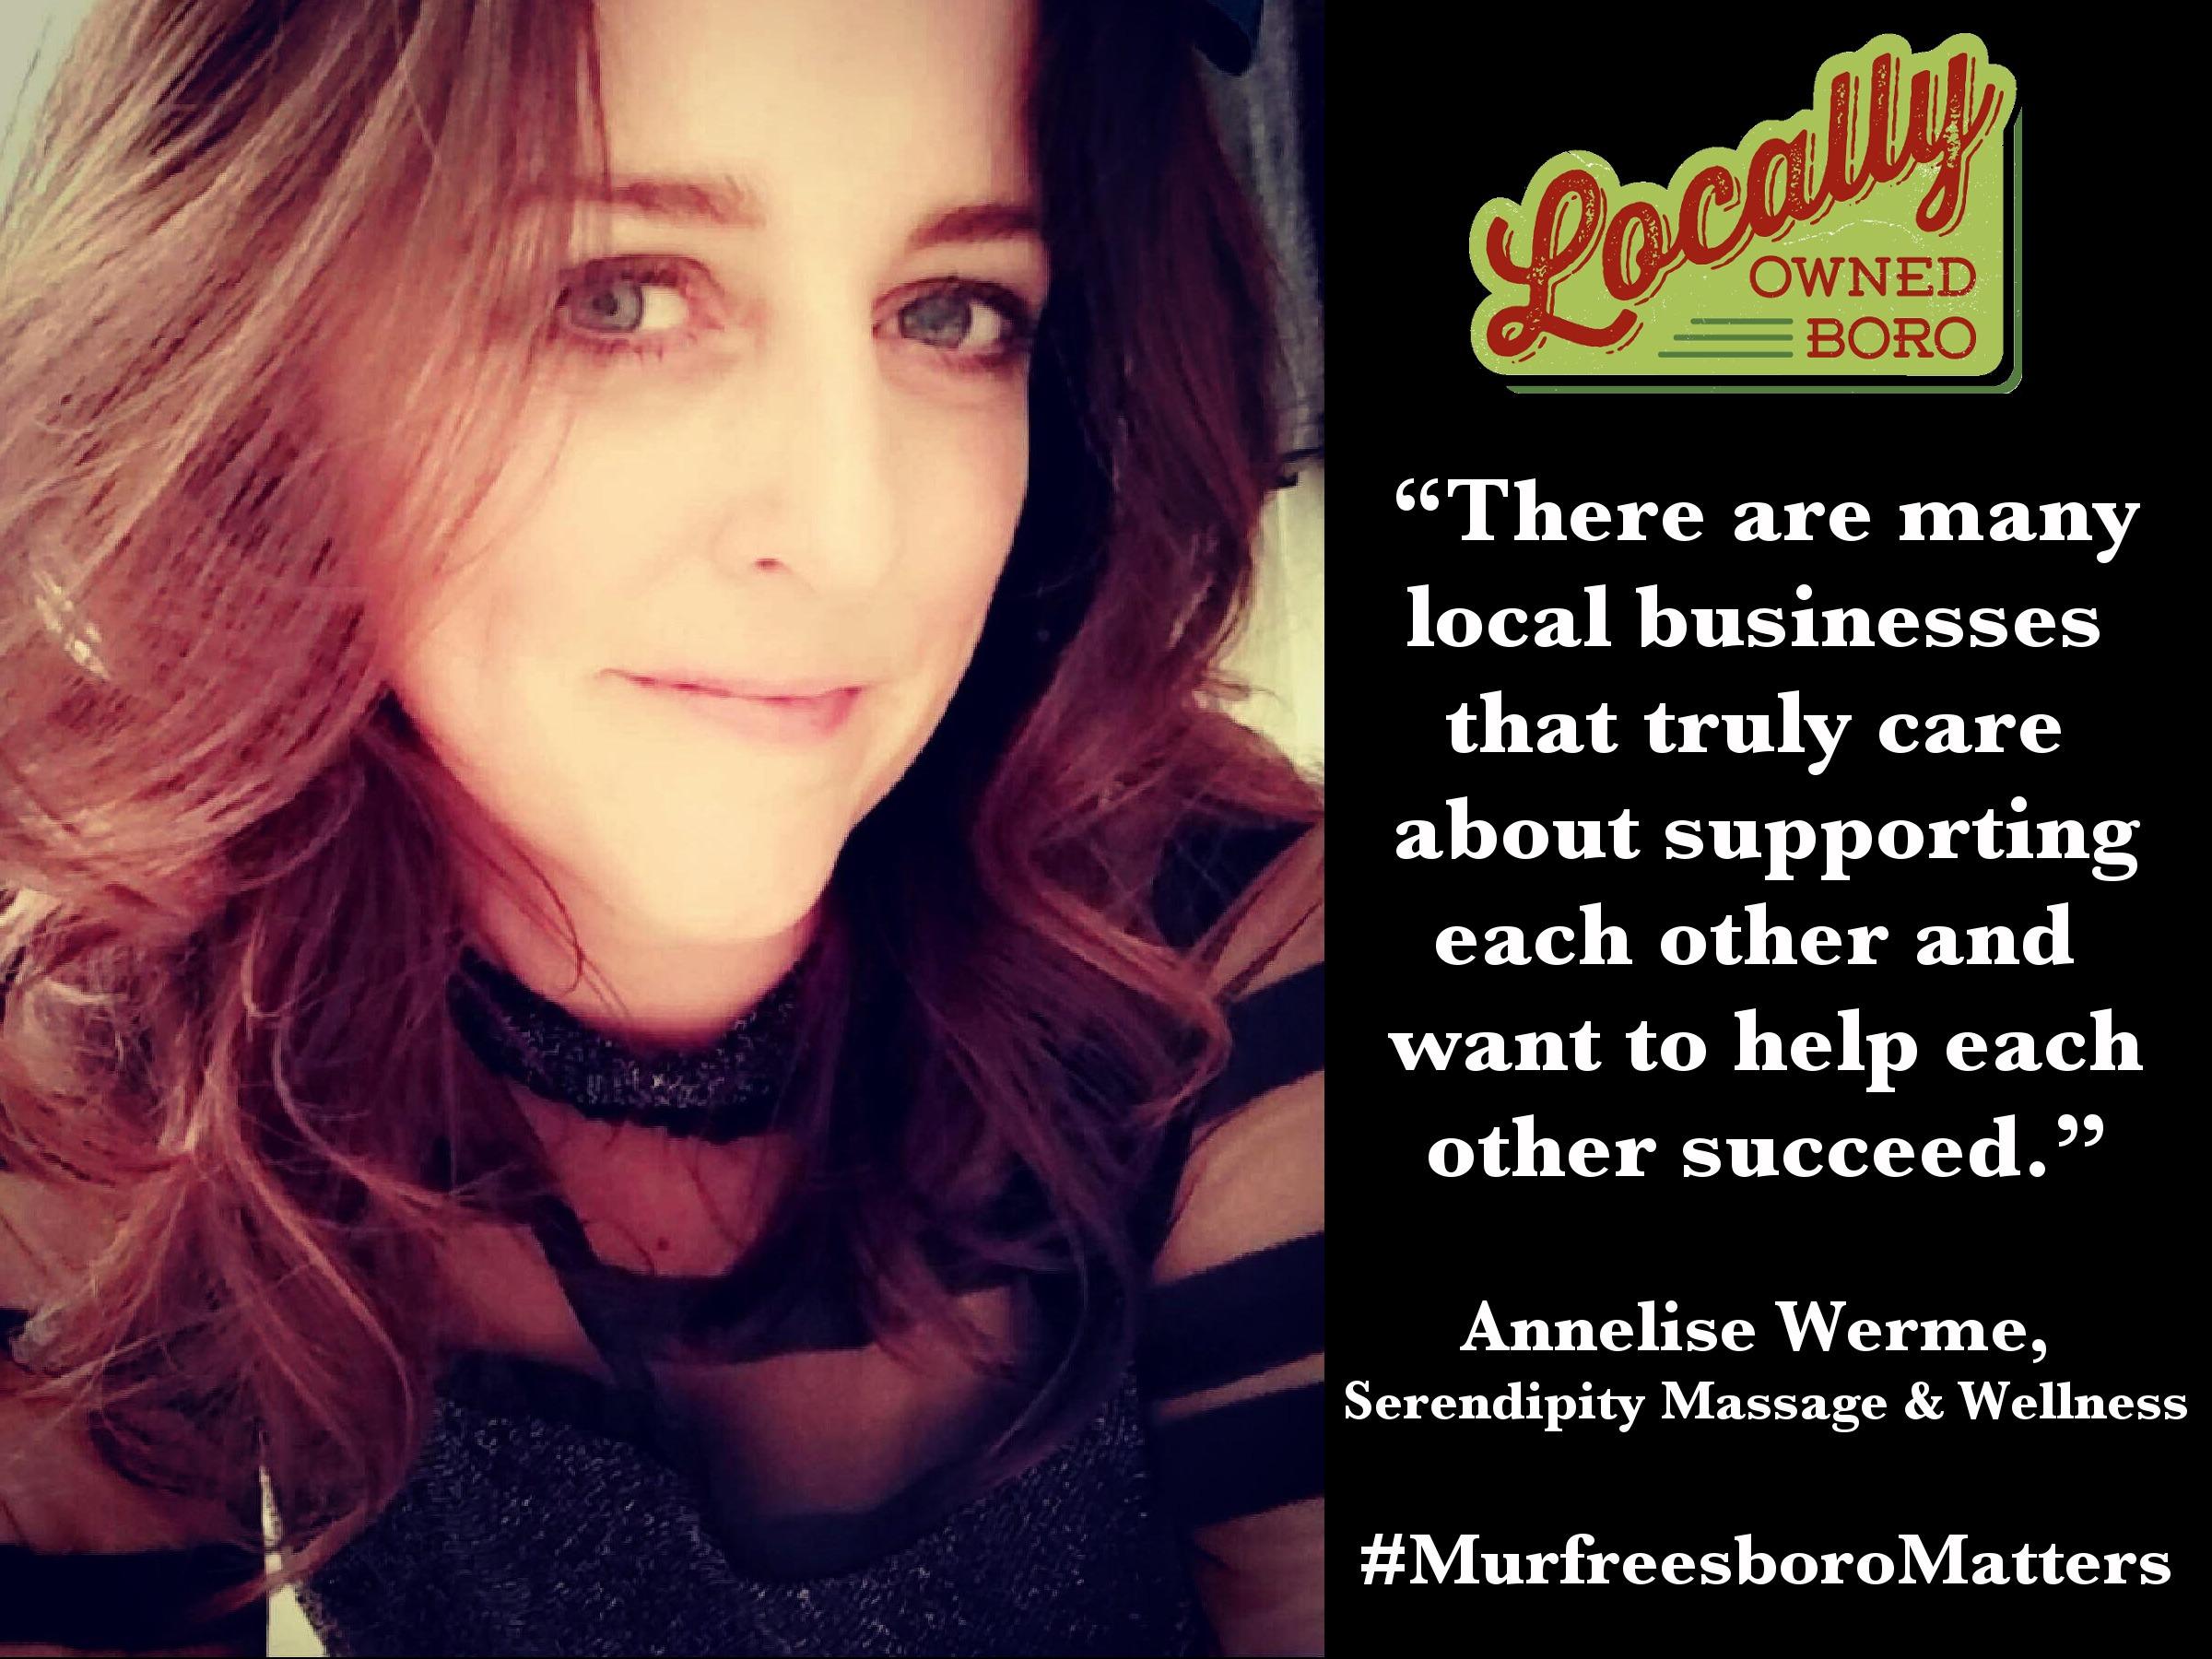 Annelise Werme, owner/operator of Serendipity Massage & Wellness